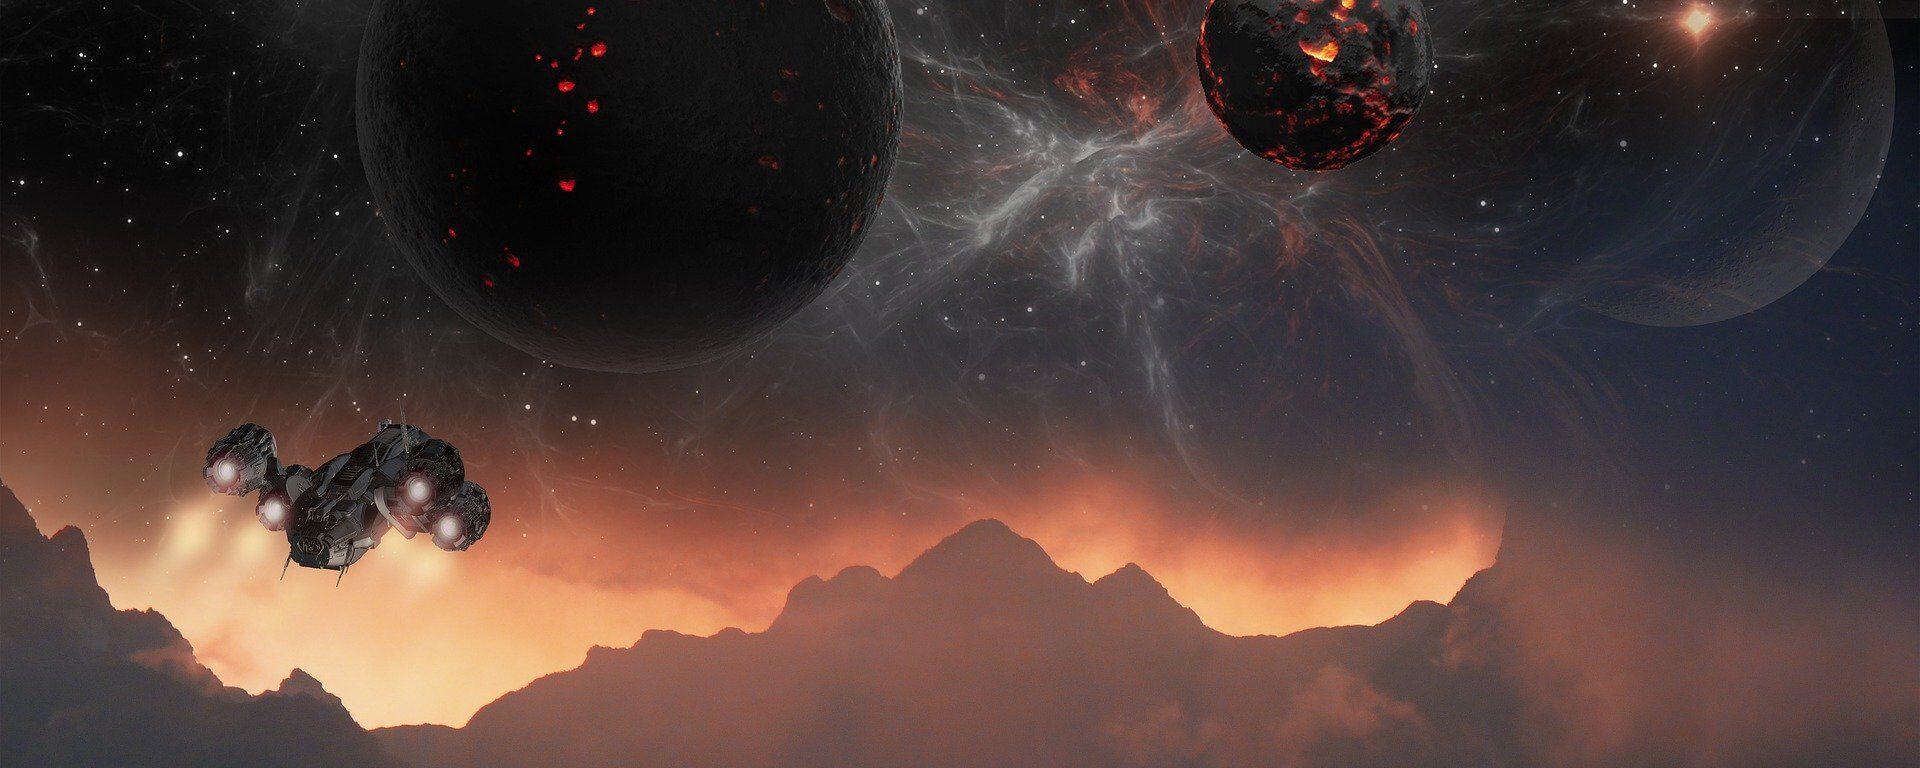 ¿Existe la vida en otros planetas?